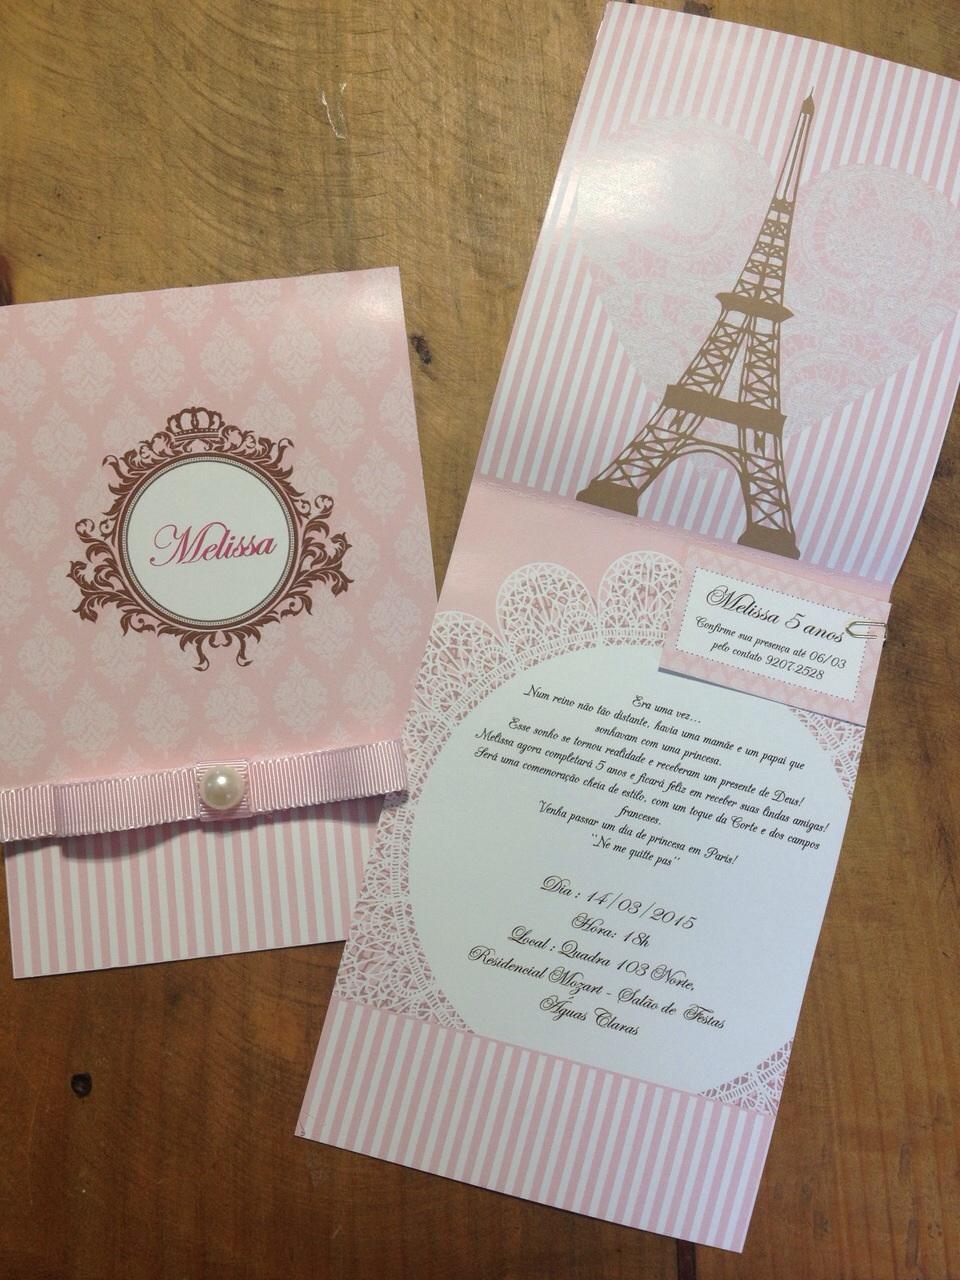 convite-princesas-em-paris-convite-casam